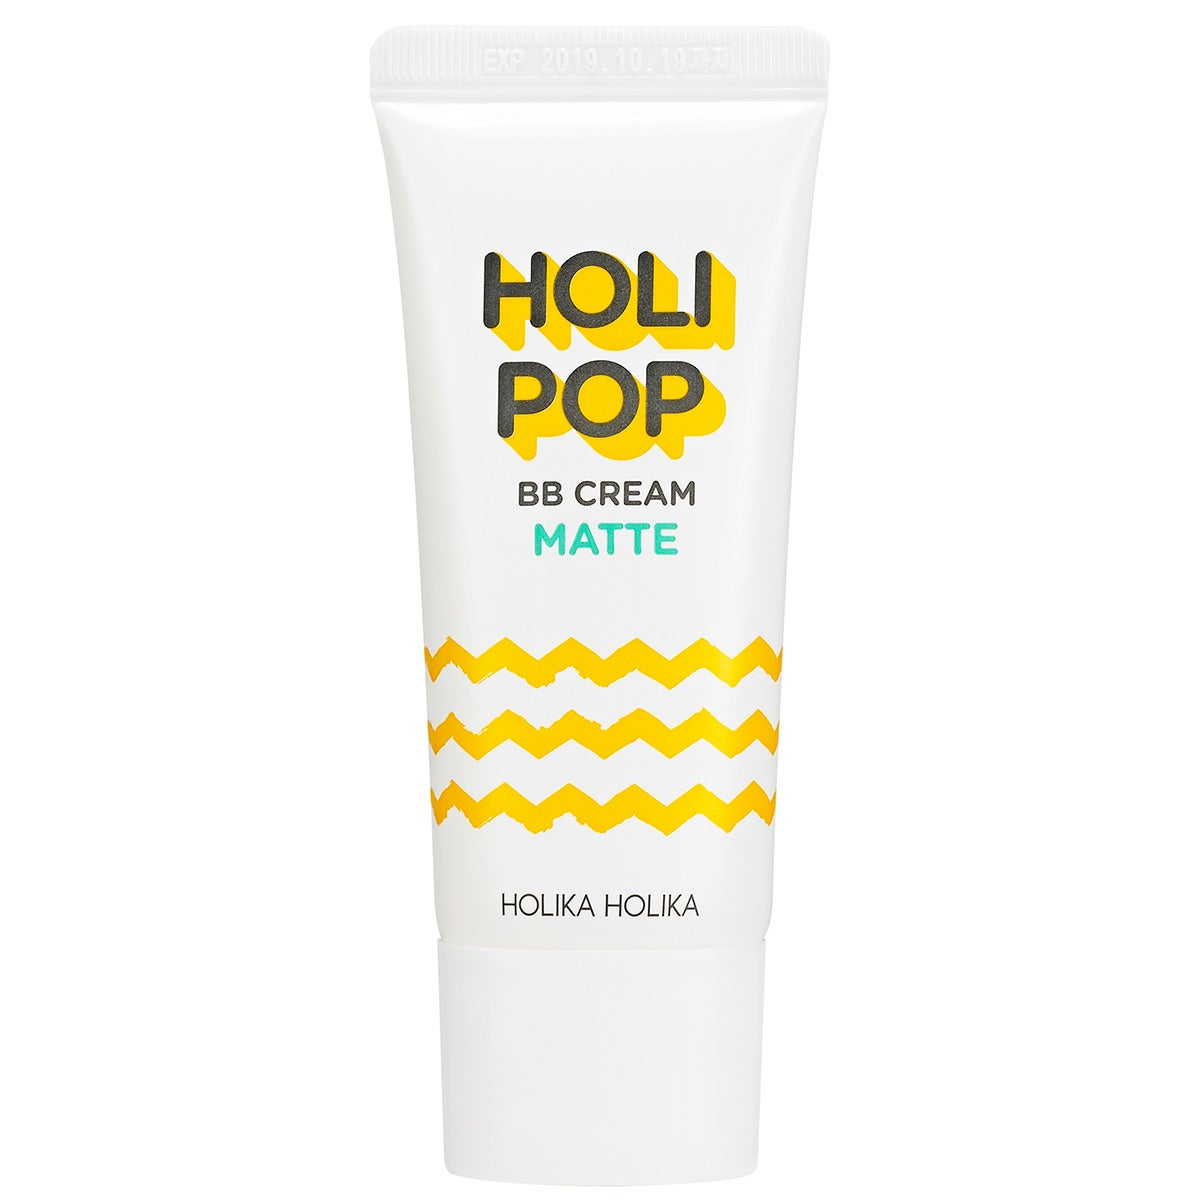 Holi Pop BB Cream Matte 30 ml Holika Holika K-Beauty: BB-kräm